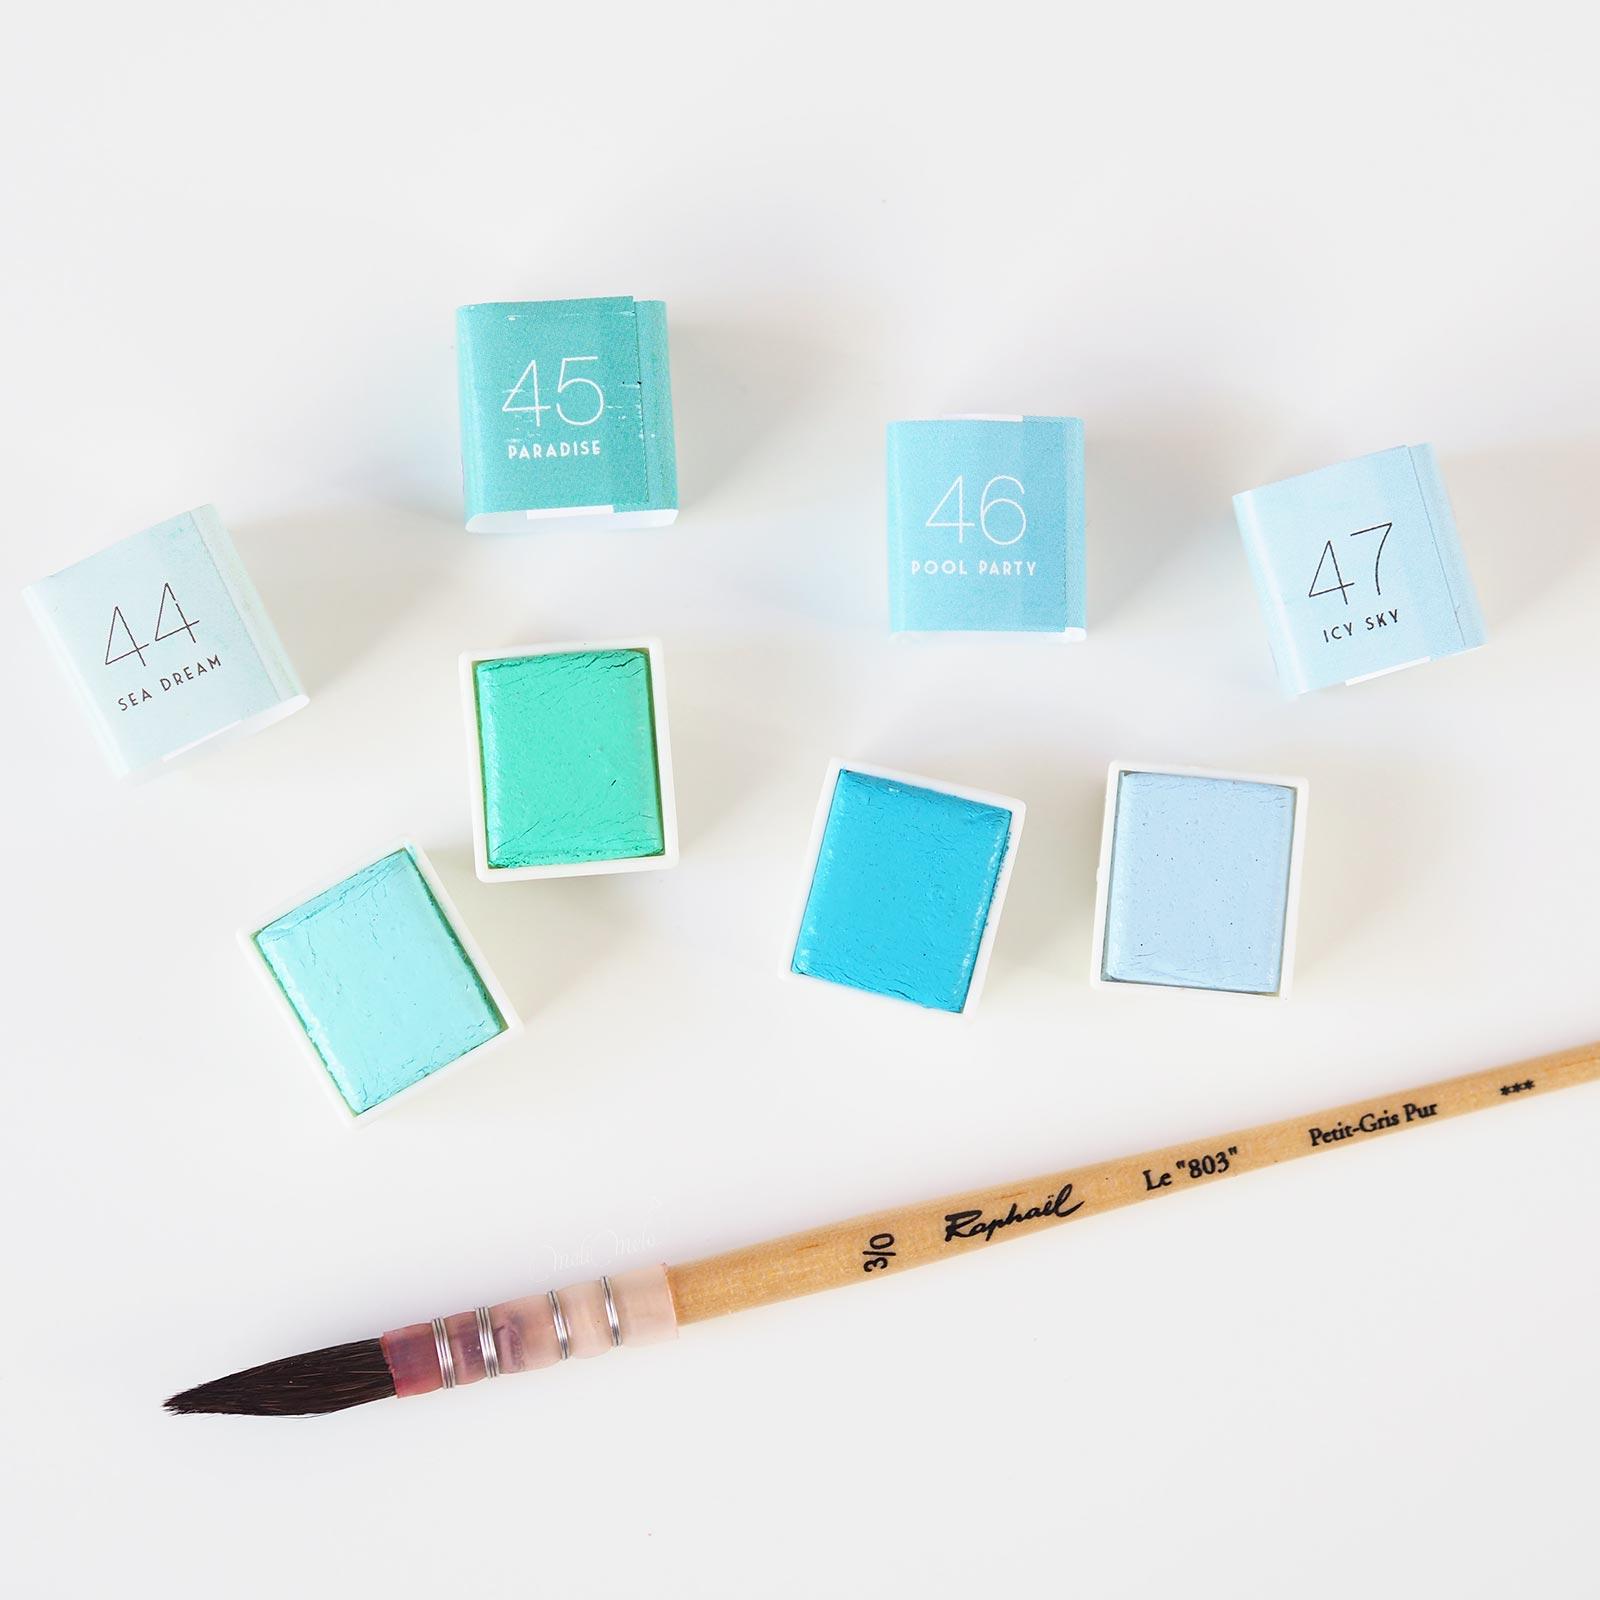 aquarelle watercolor pastel dreams 44-45-46-47 prima Boutique MeliMelo